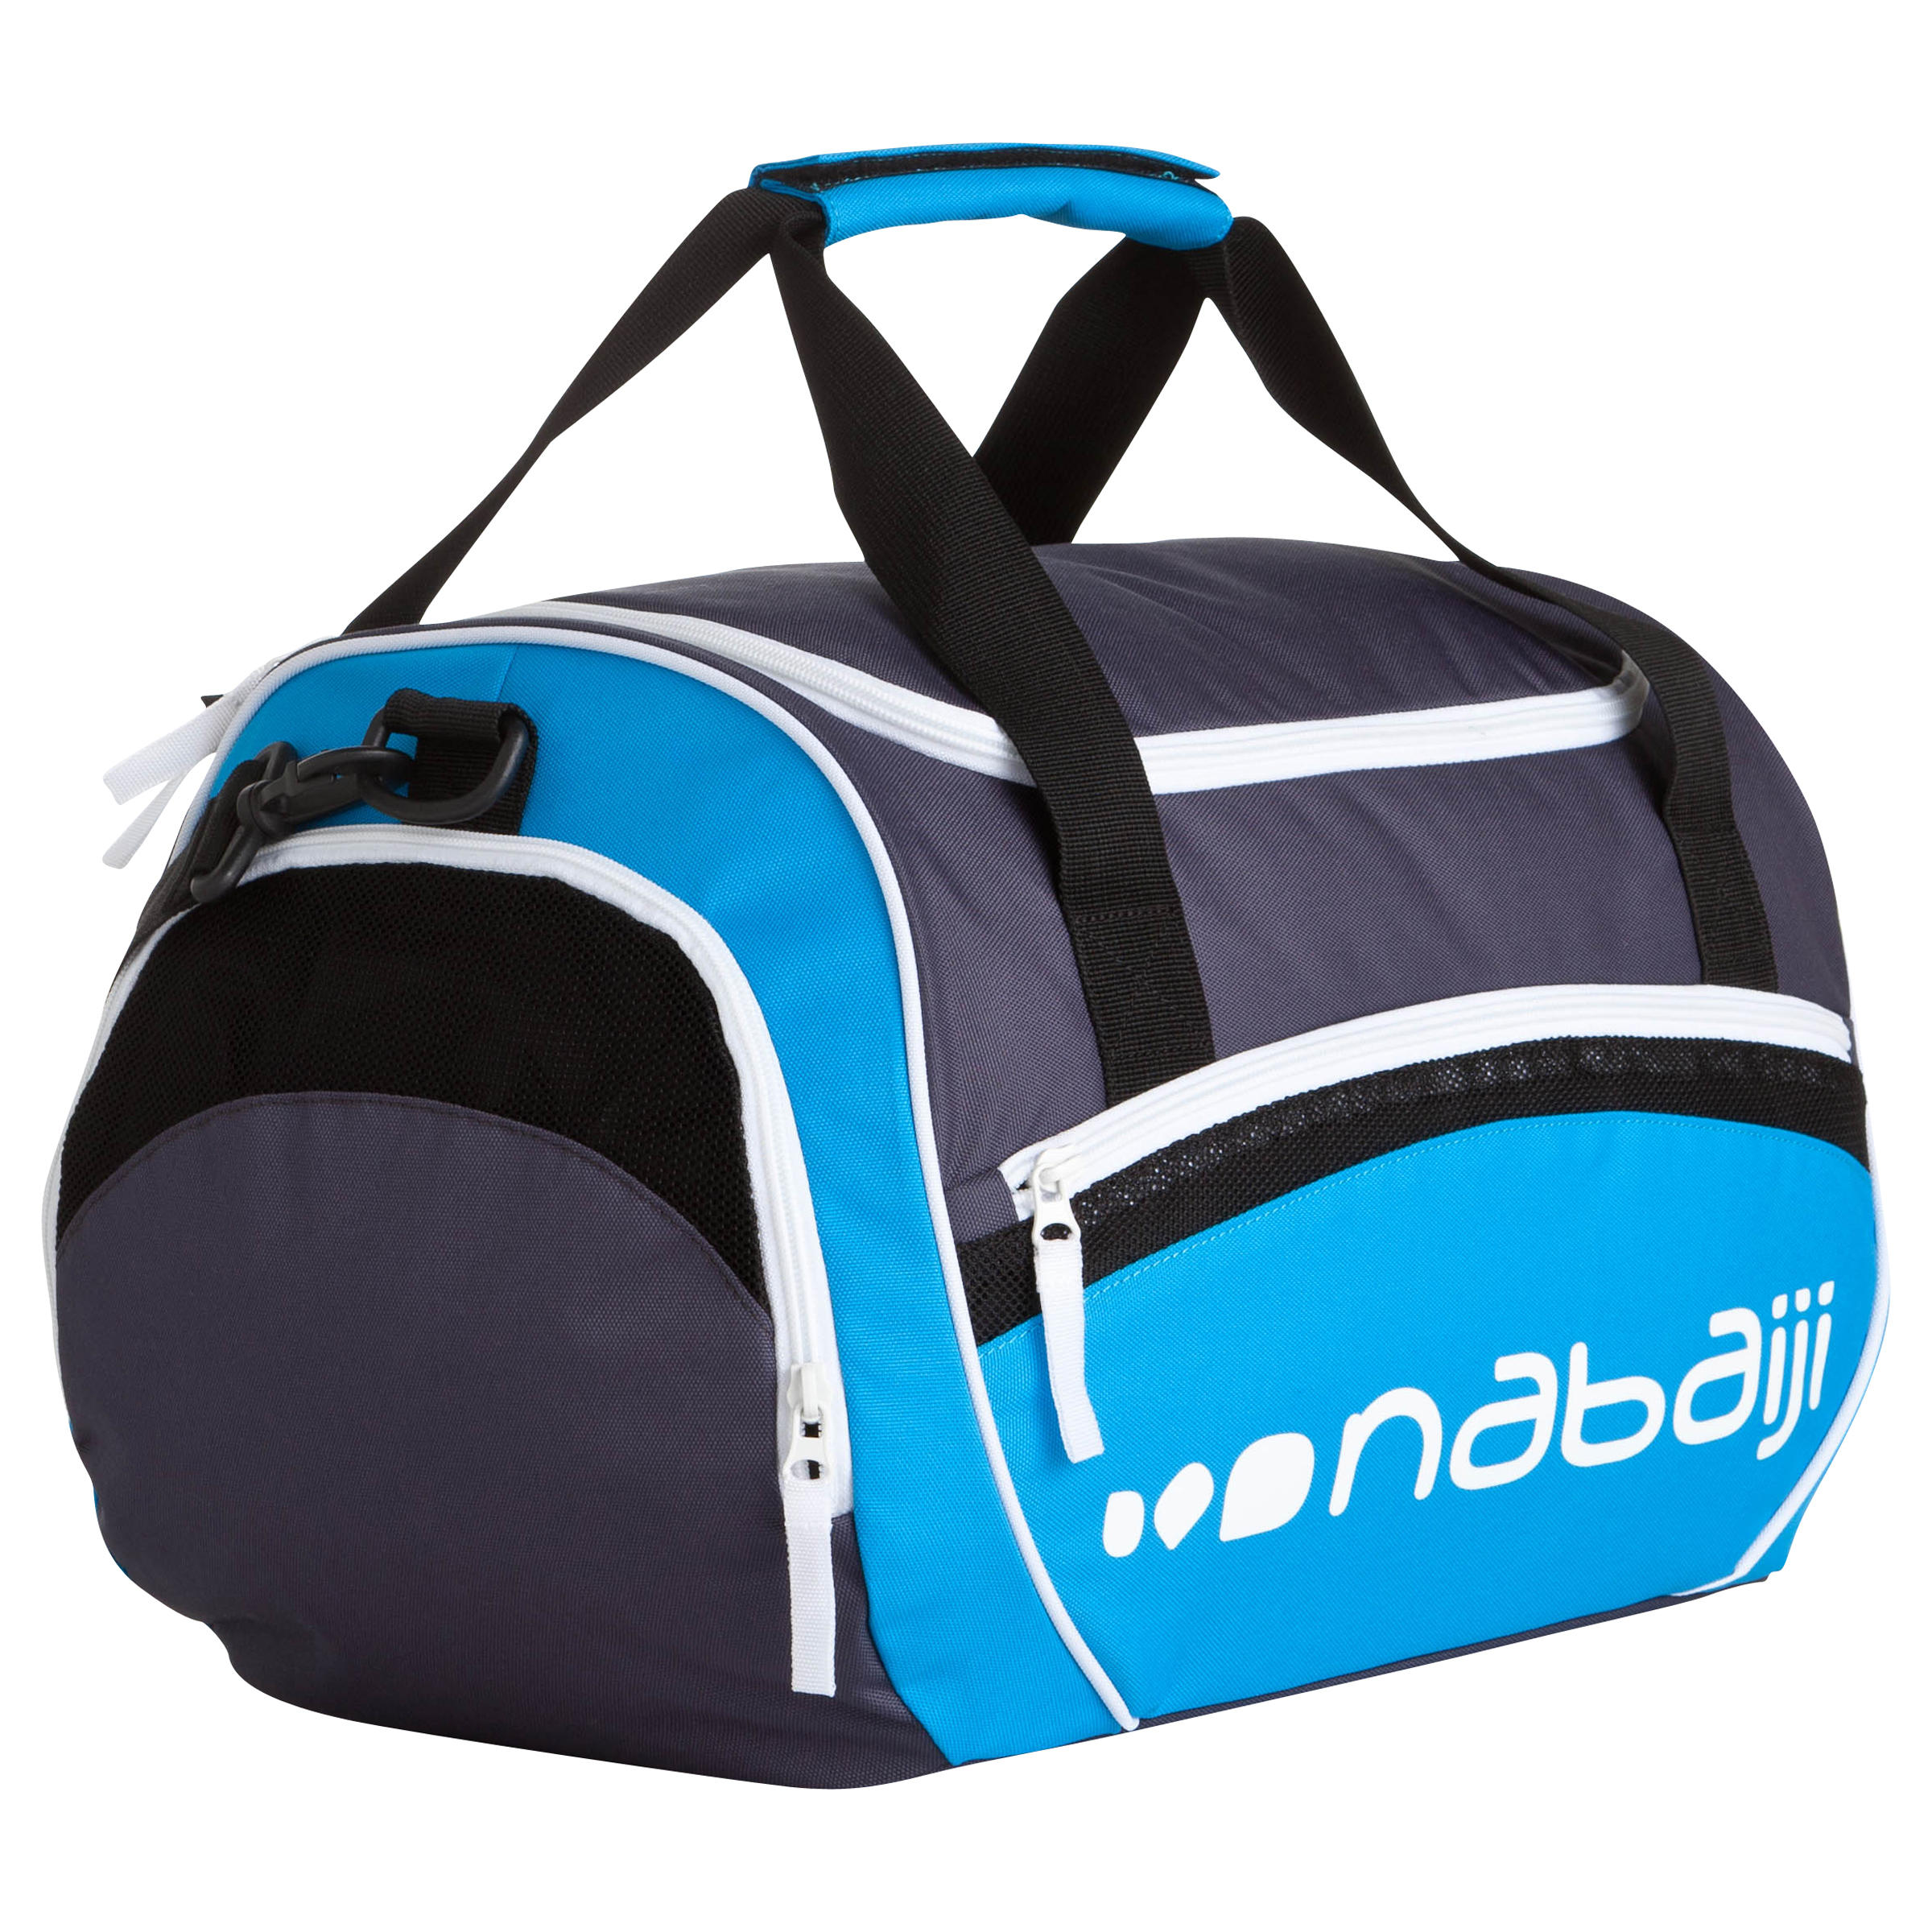 Swimy 30L Swim Bag - Blue Grey